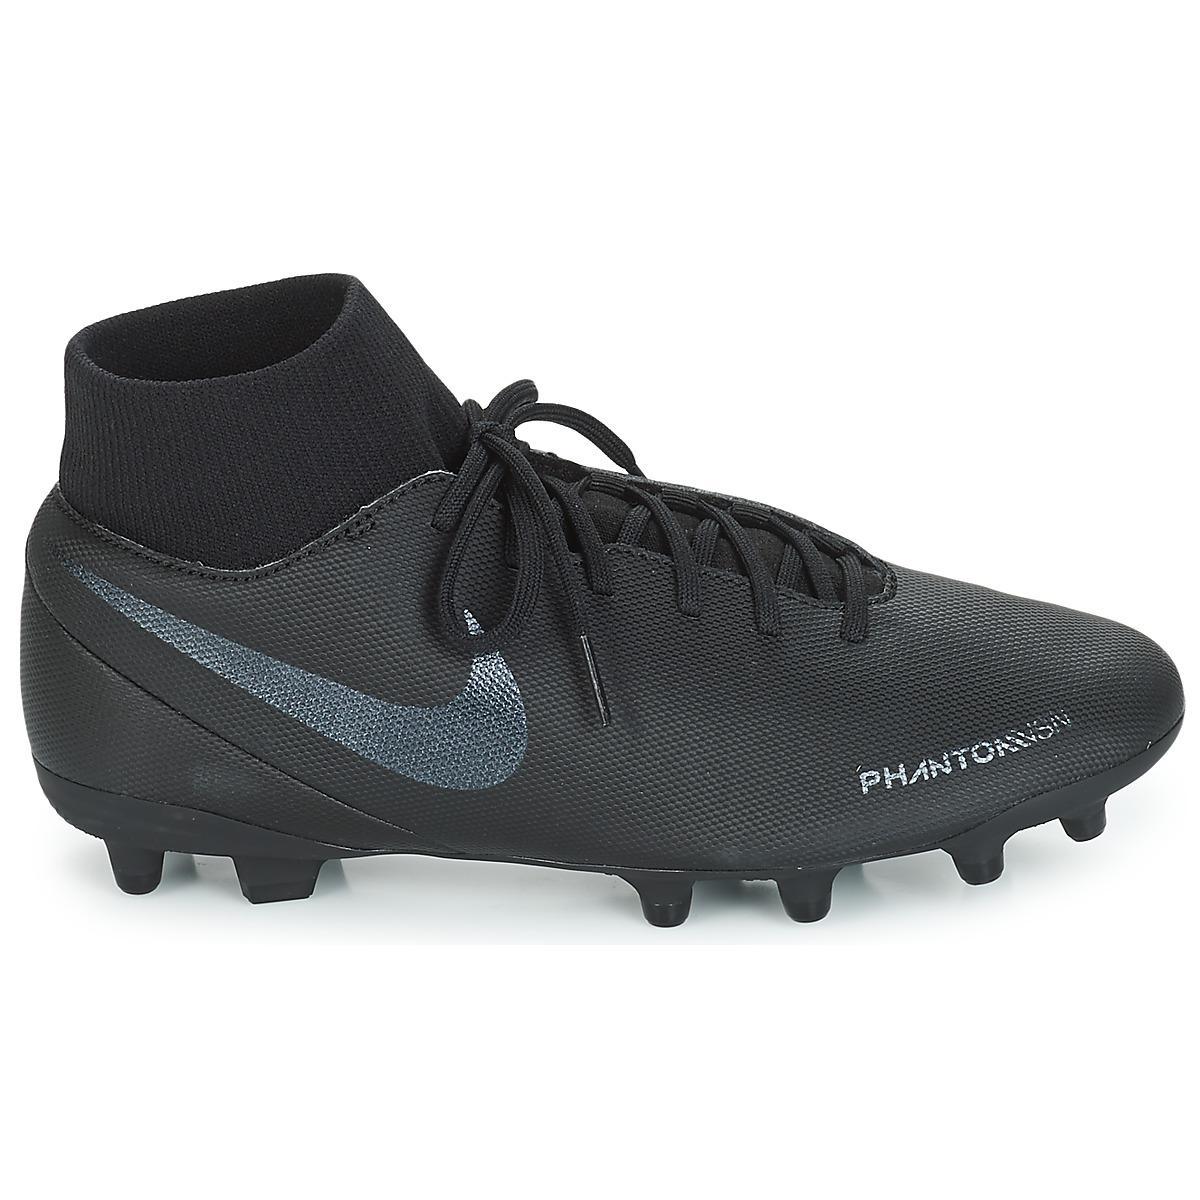 8f916d69f Nike - Black Phantom Vsn Club Df Mg Football Boots - Lyst. View fullscreen